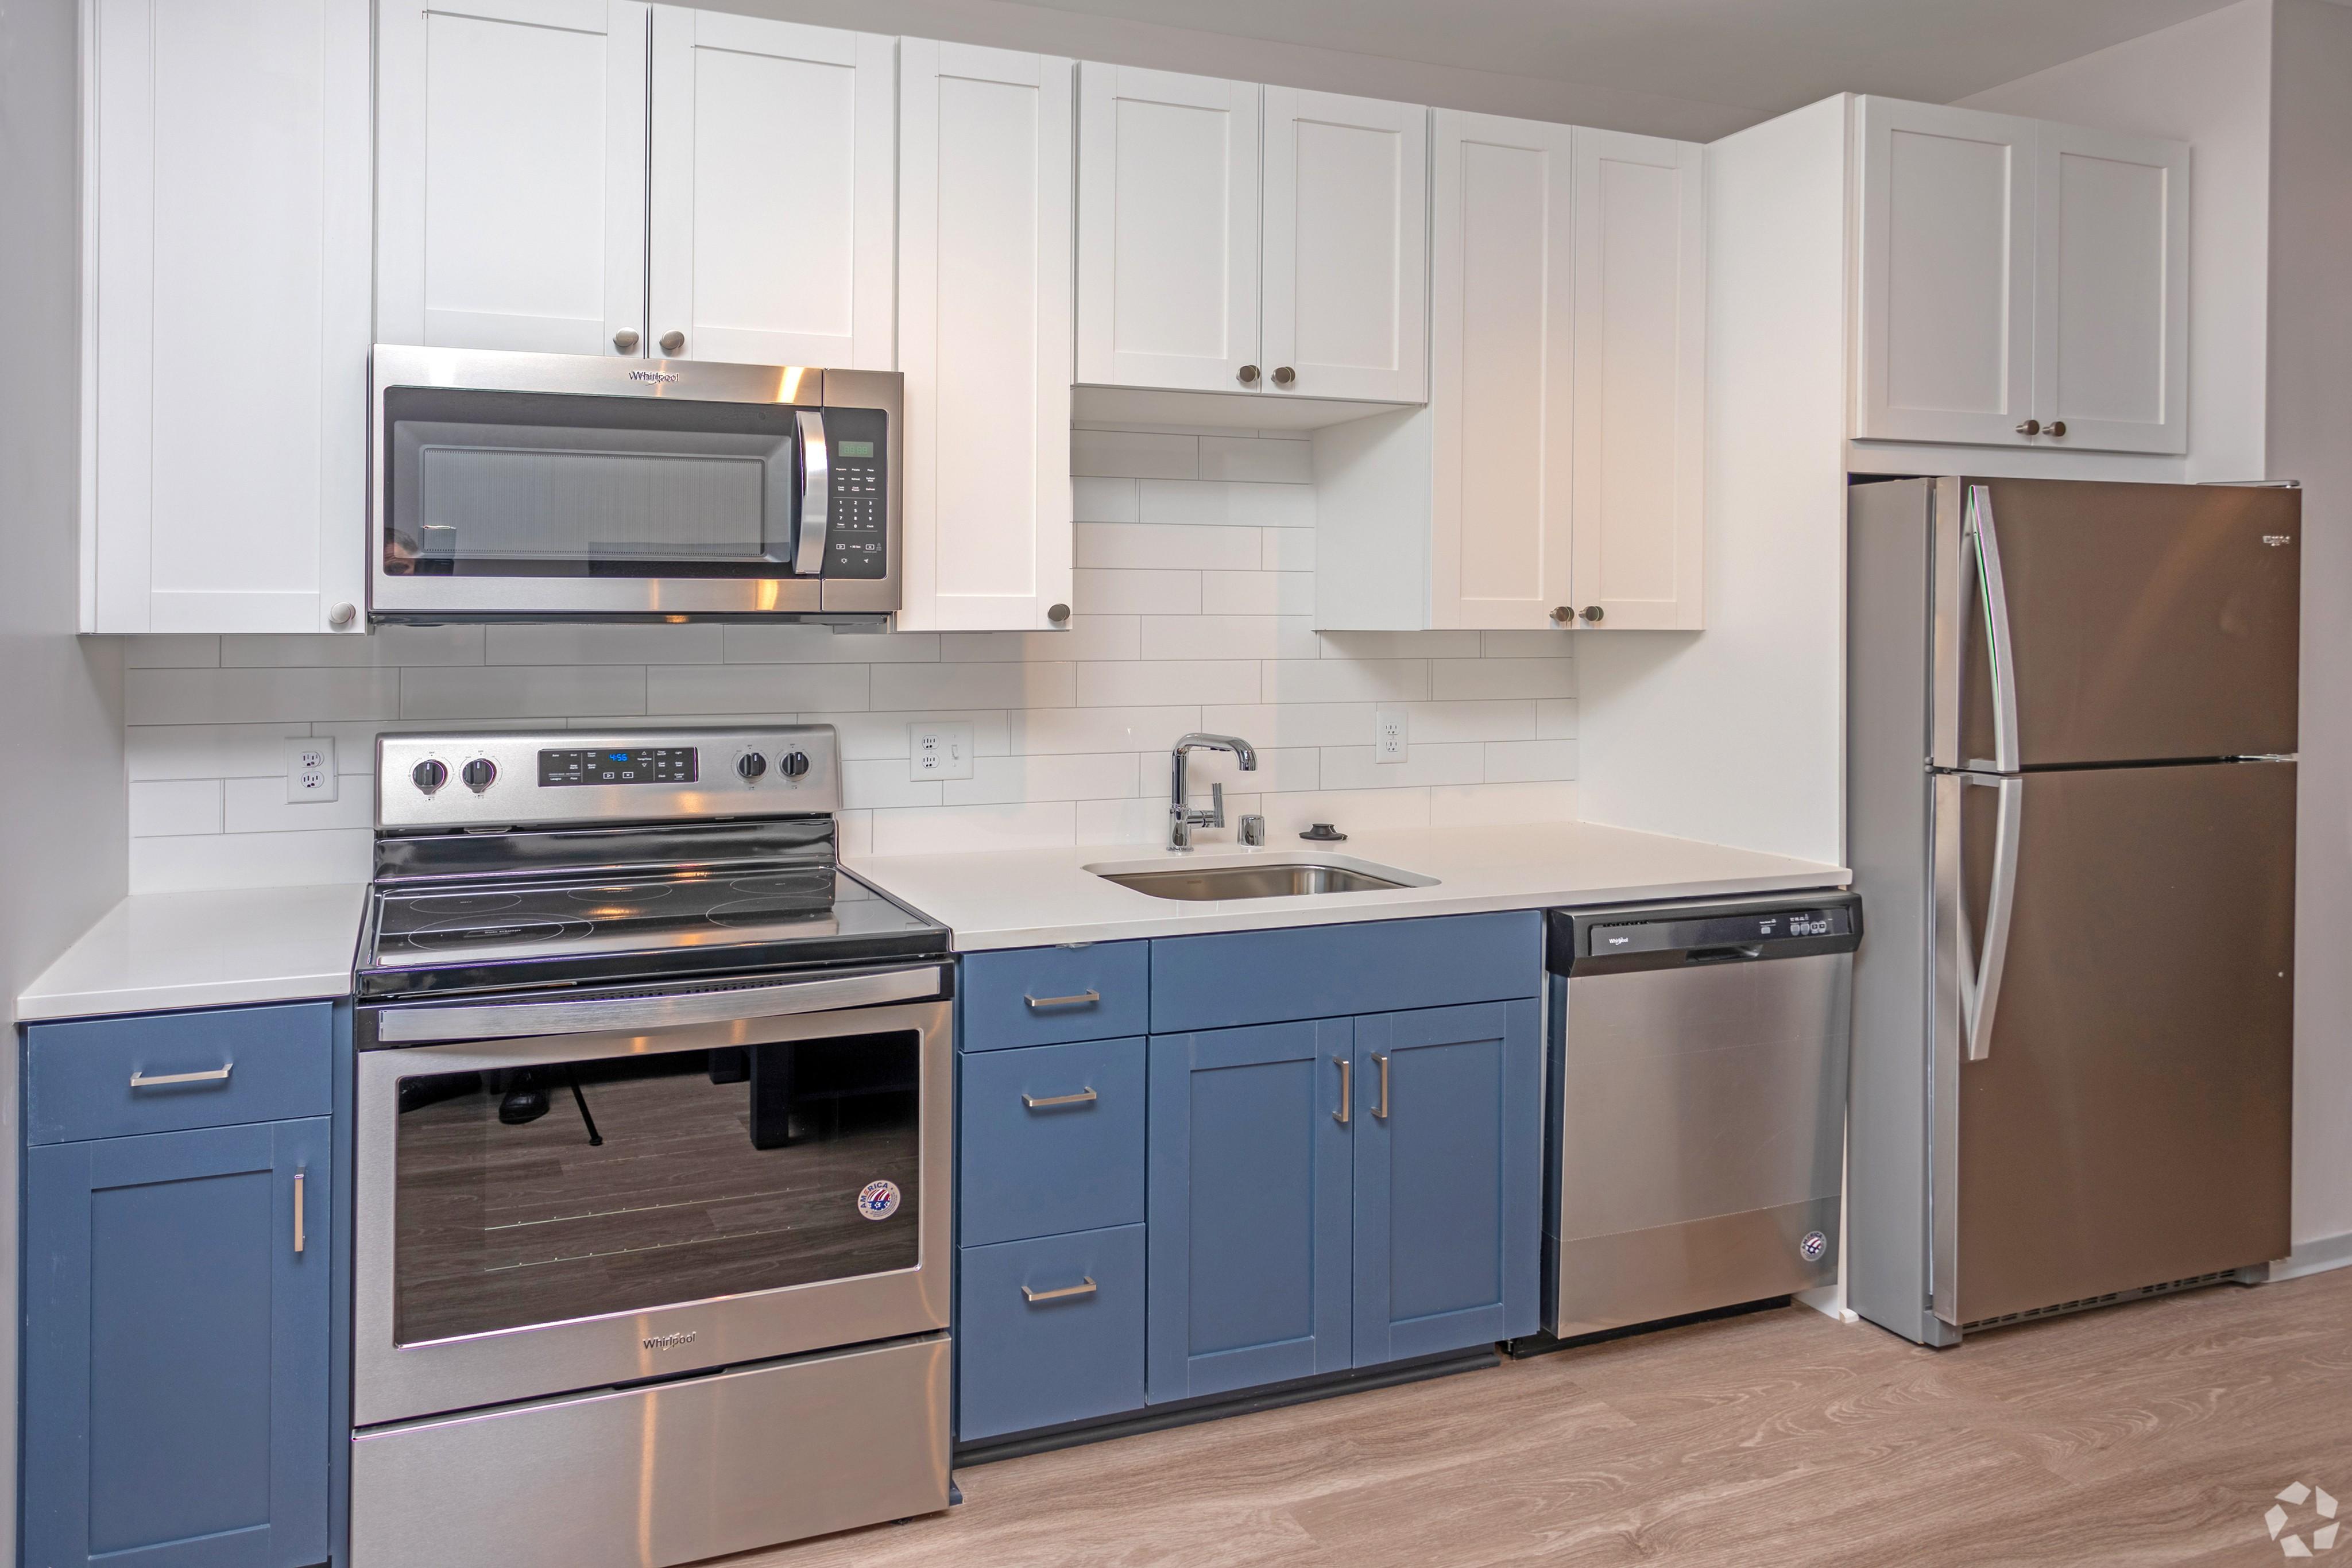 Apartments Near Bethel Student Housing - HERE Minneapolis for Bethel University Students in Saint Paul, MN